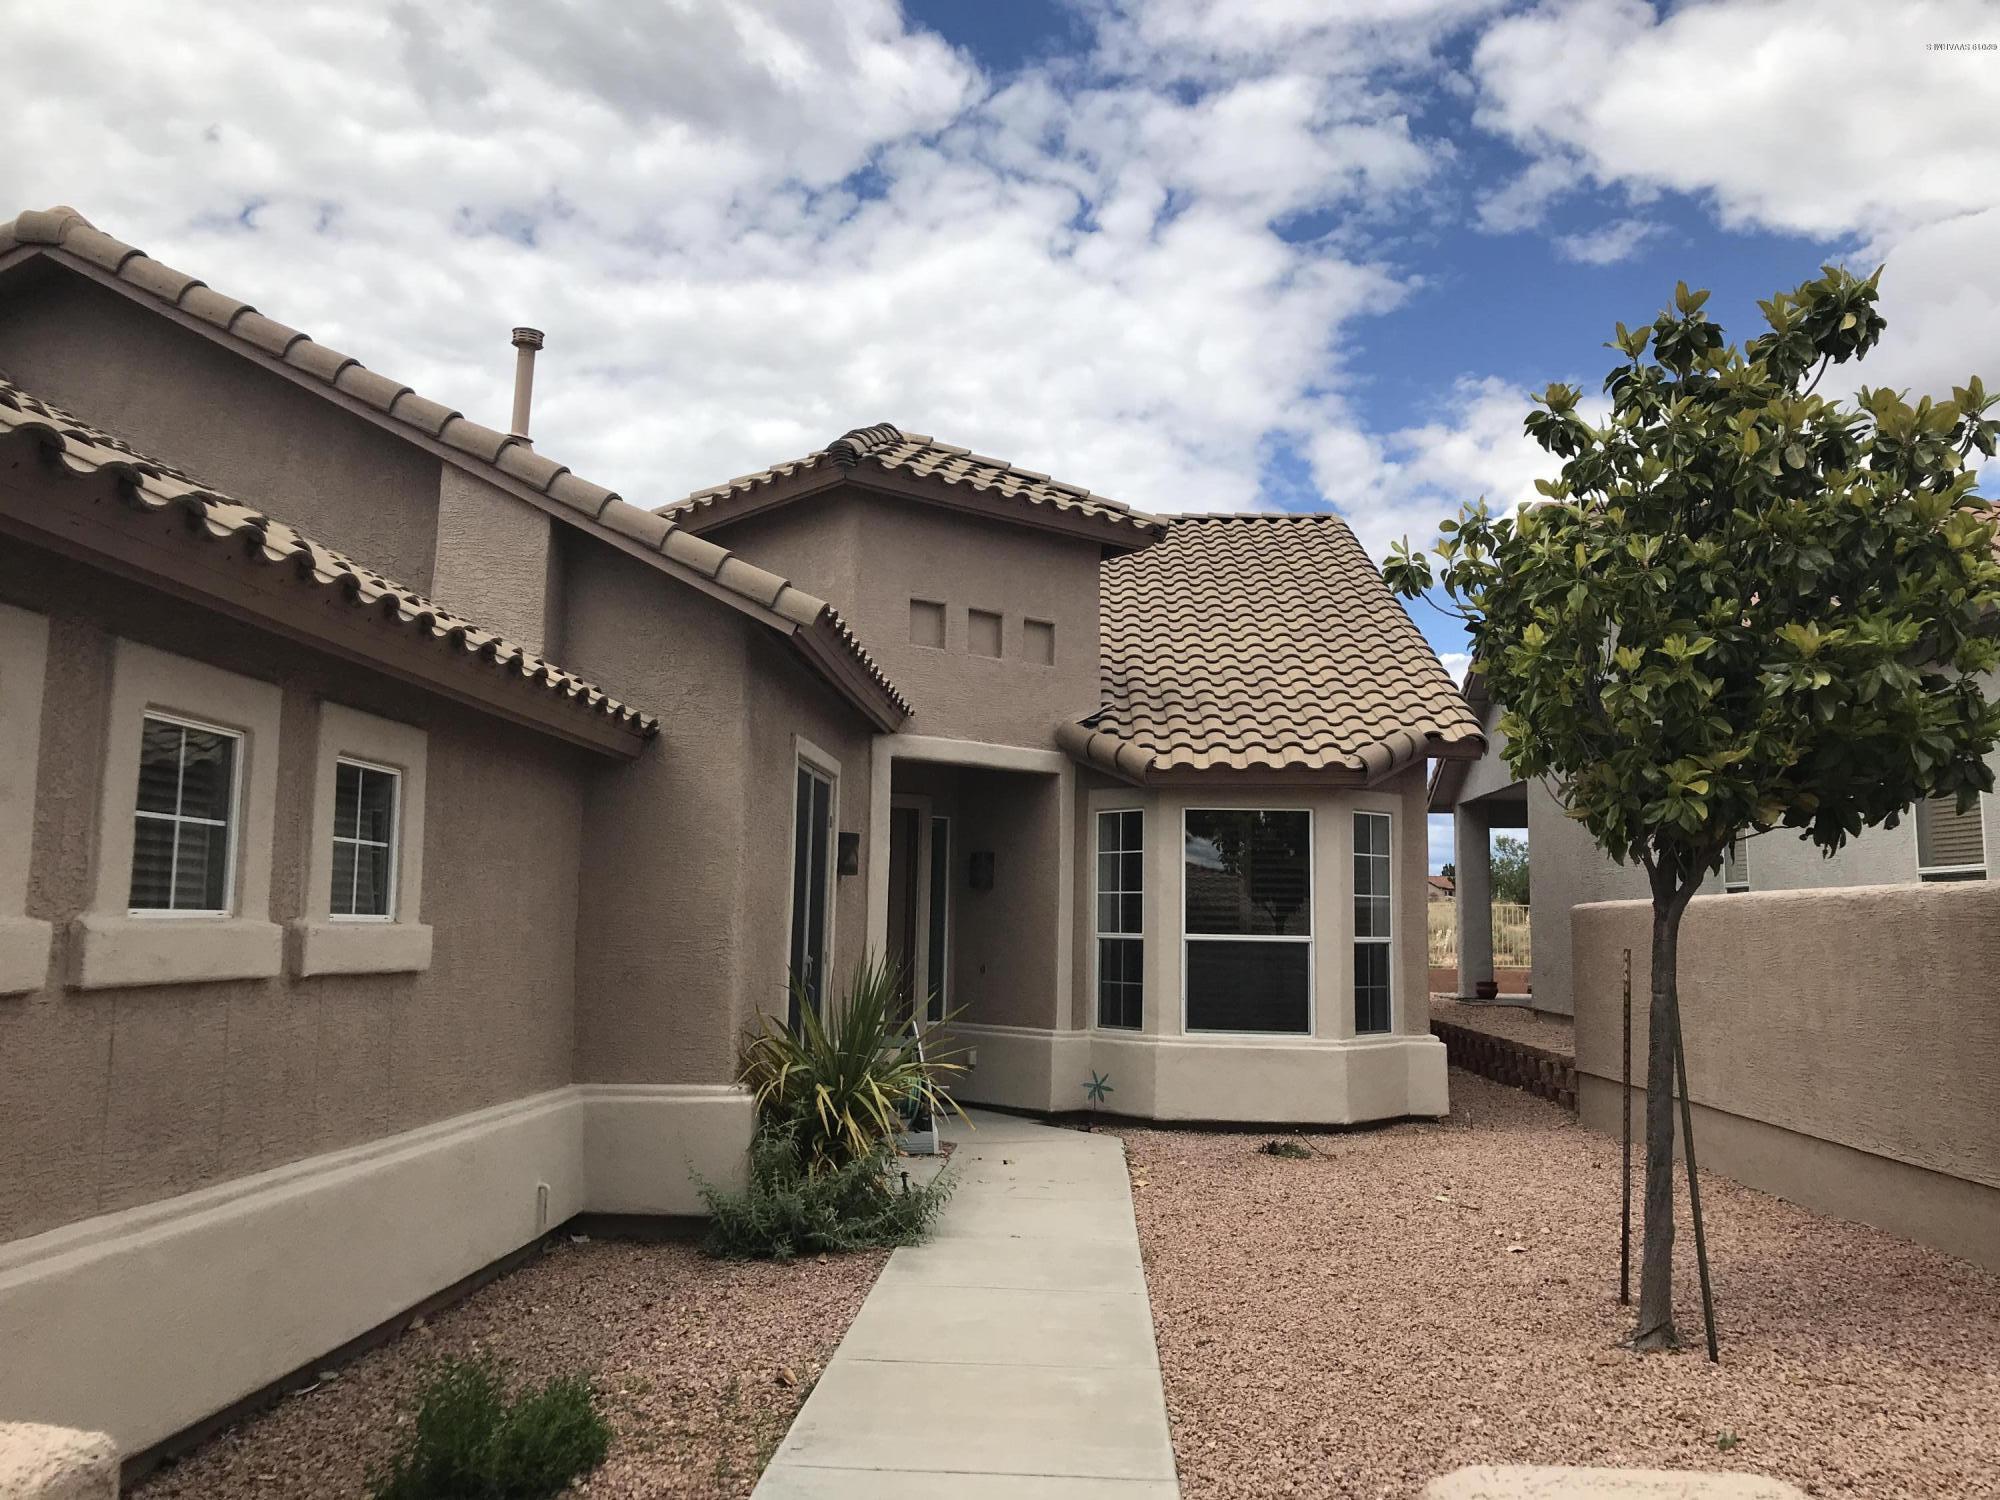 960 S Golf View Drive Cornville, AZ 86325